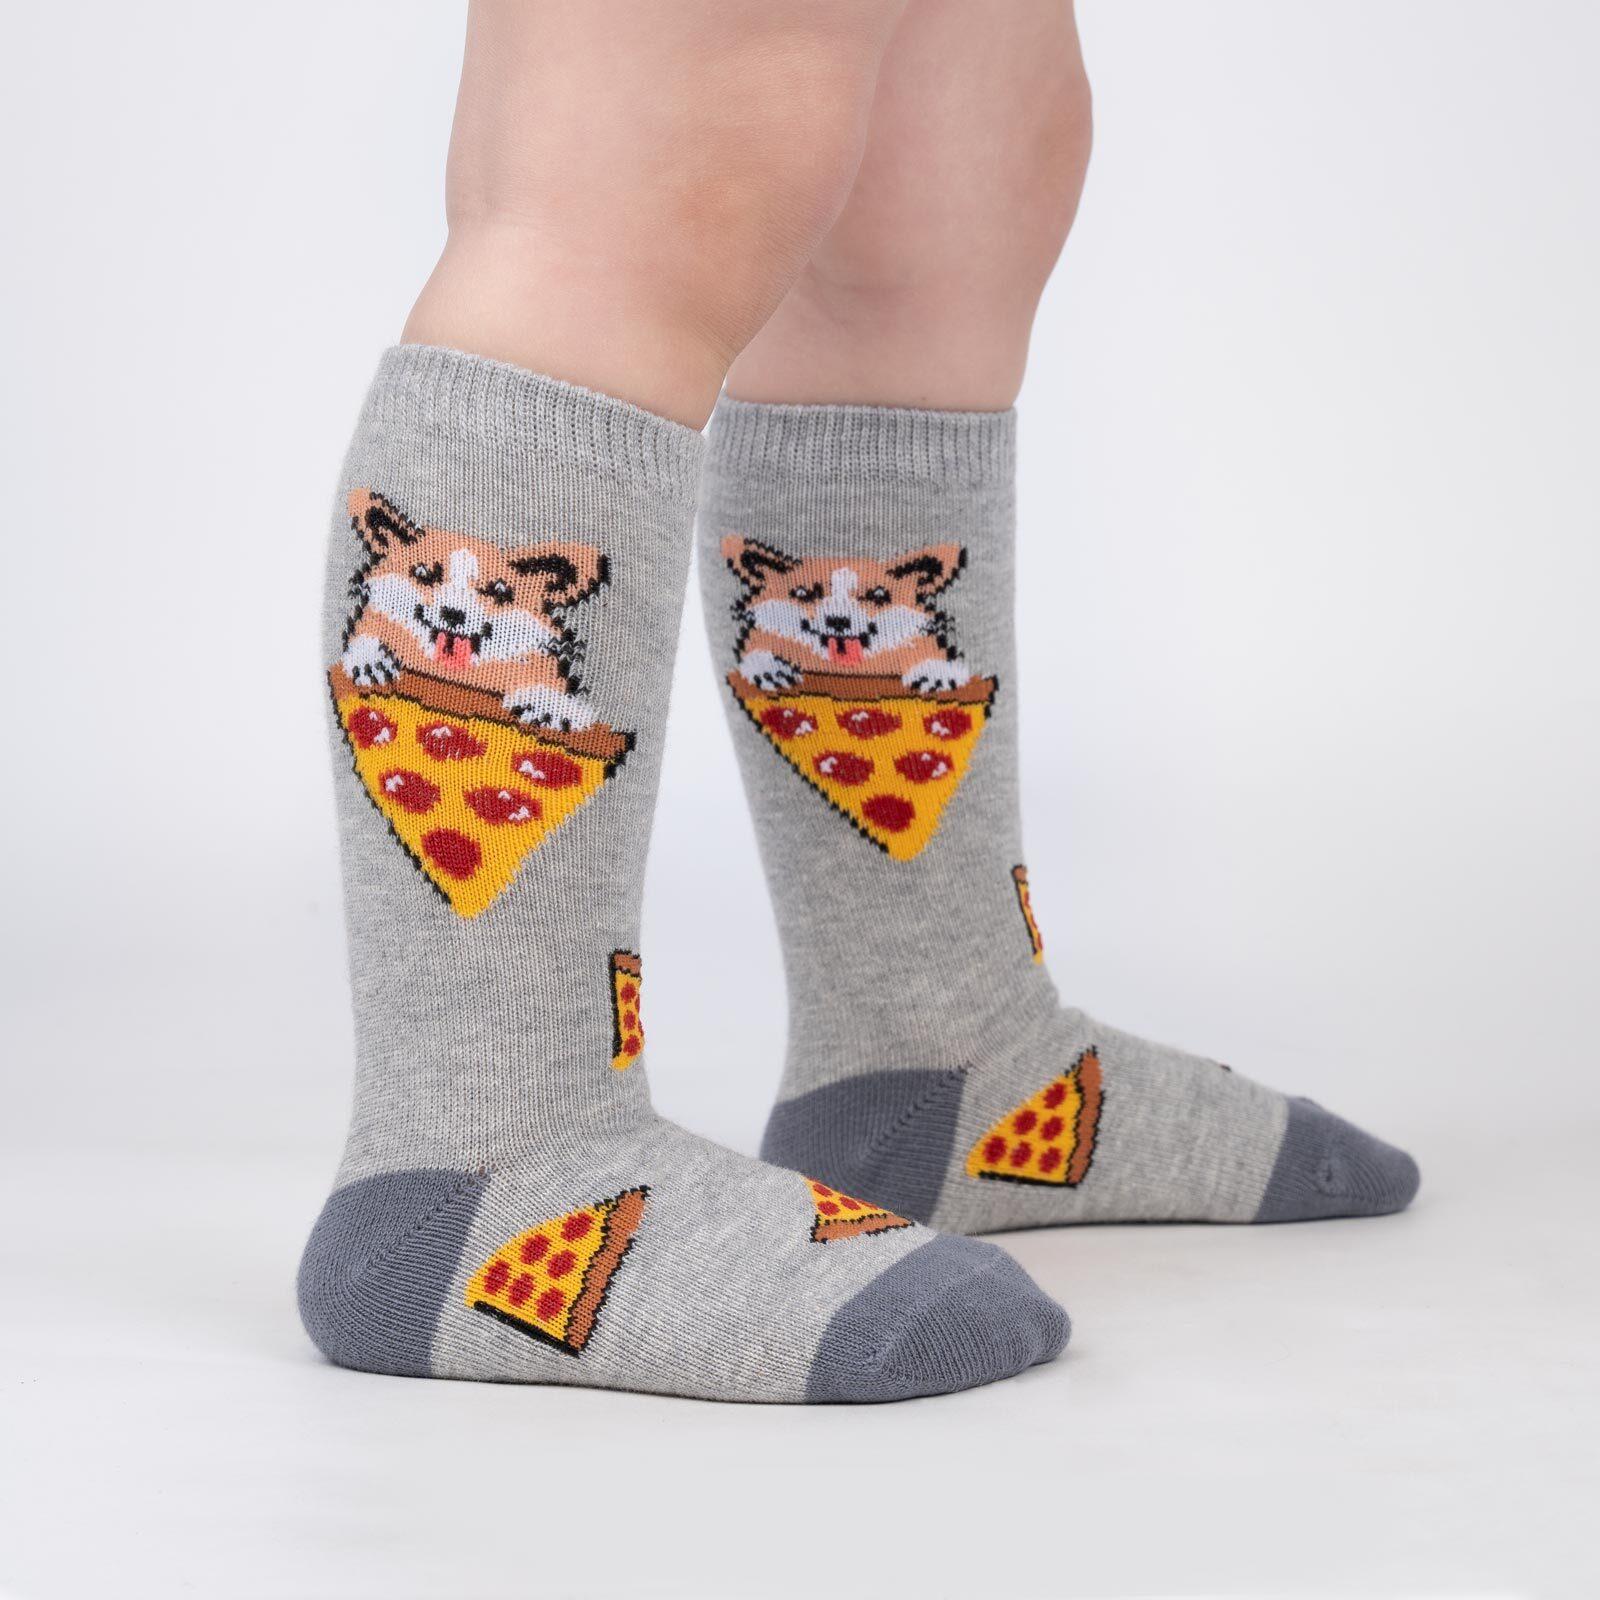 model wearing Kid's Best Food - Adorable Corgi Pizza Knee High Socks Grey - Toddler